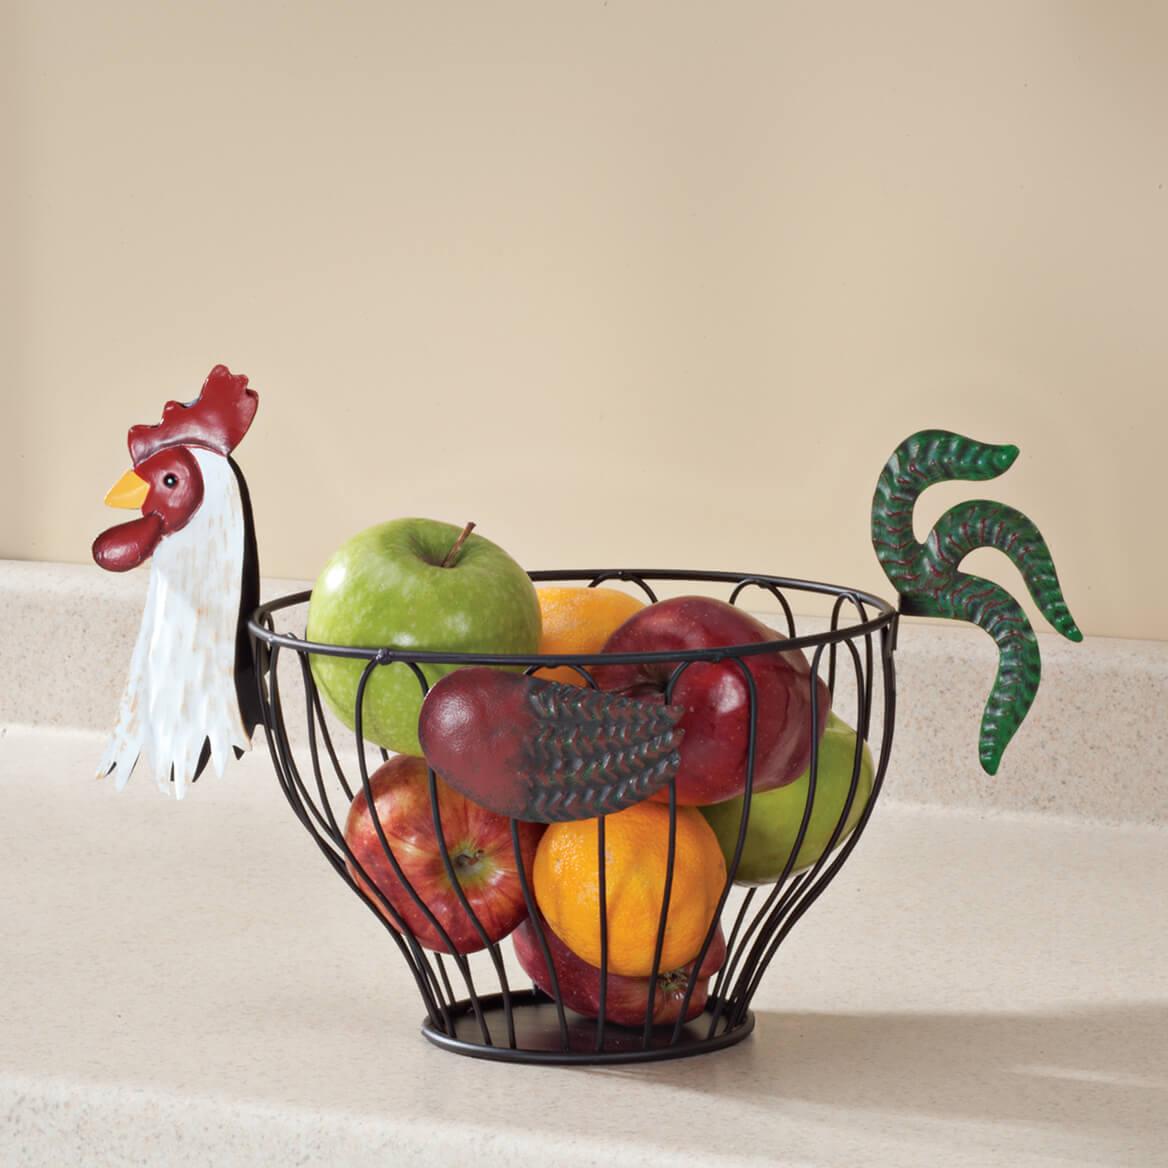 Design Fruit Storage Basket rooster fruit basket wire miles kimball 353093